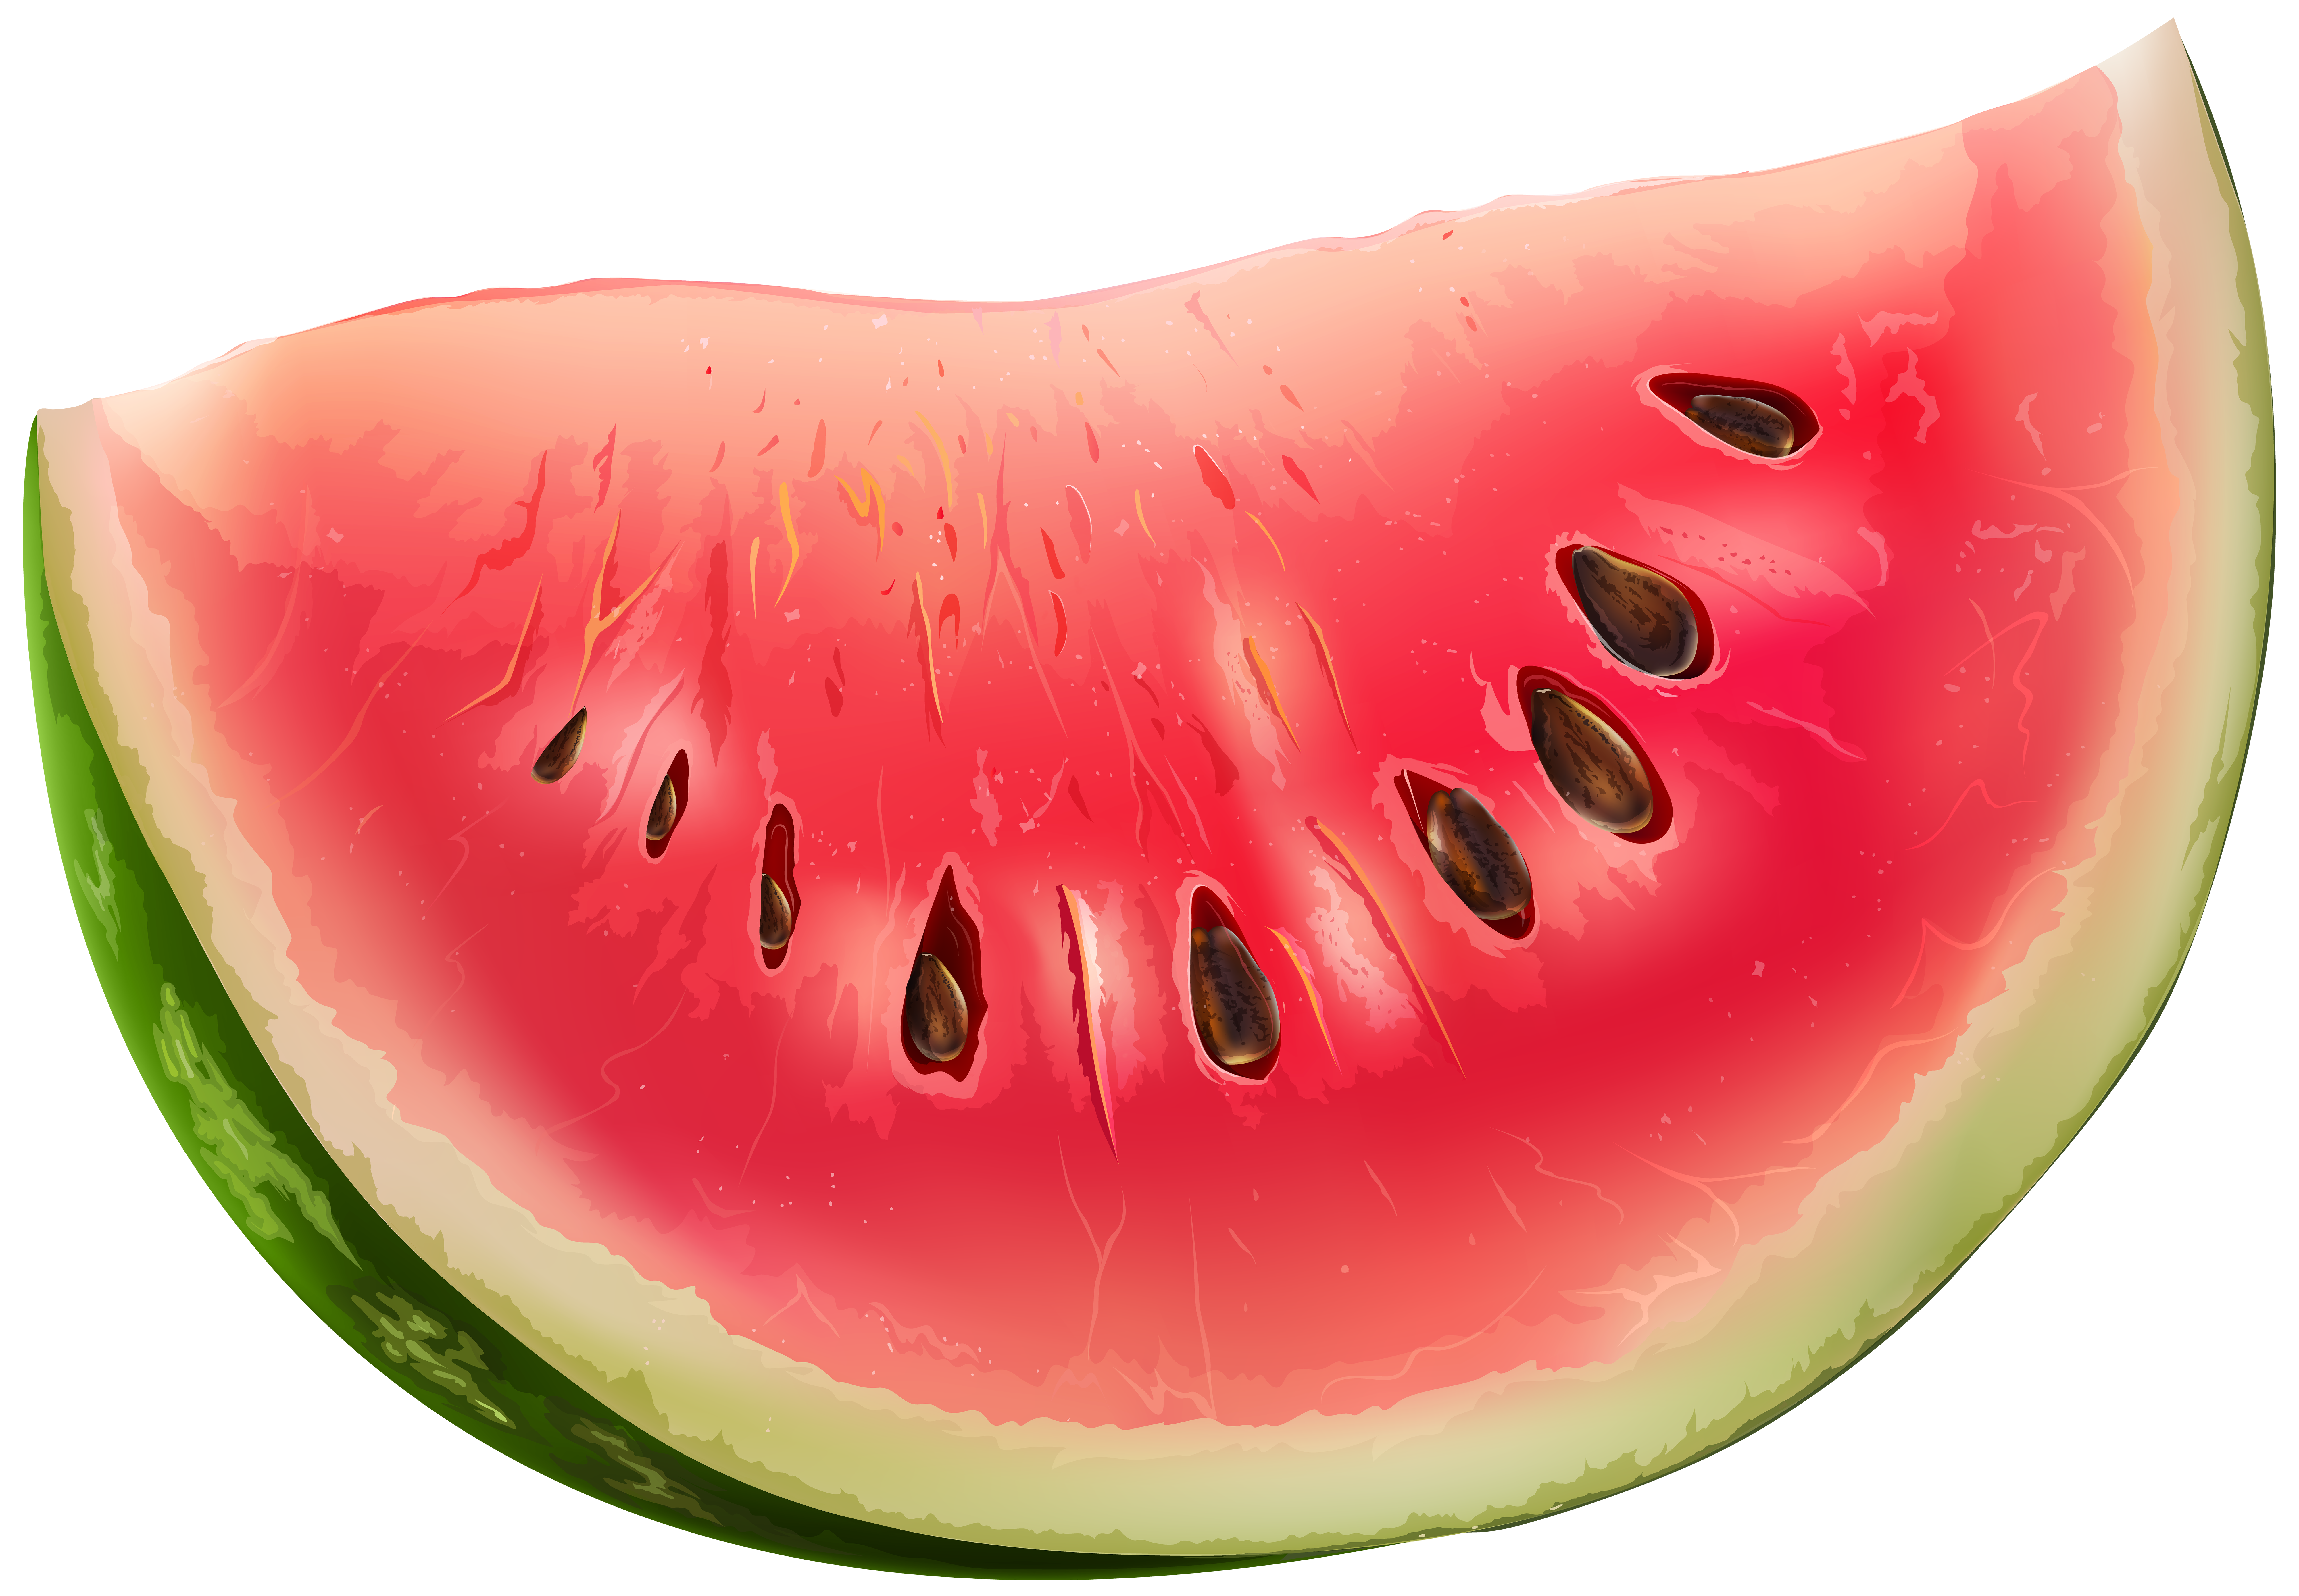 Slice png clip art. Watermelon clipart different fruit